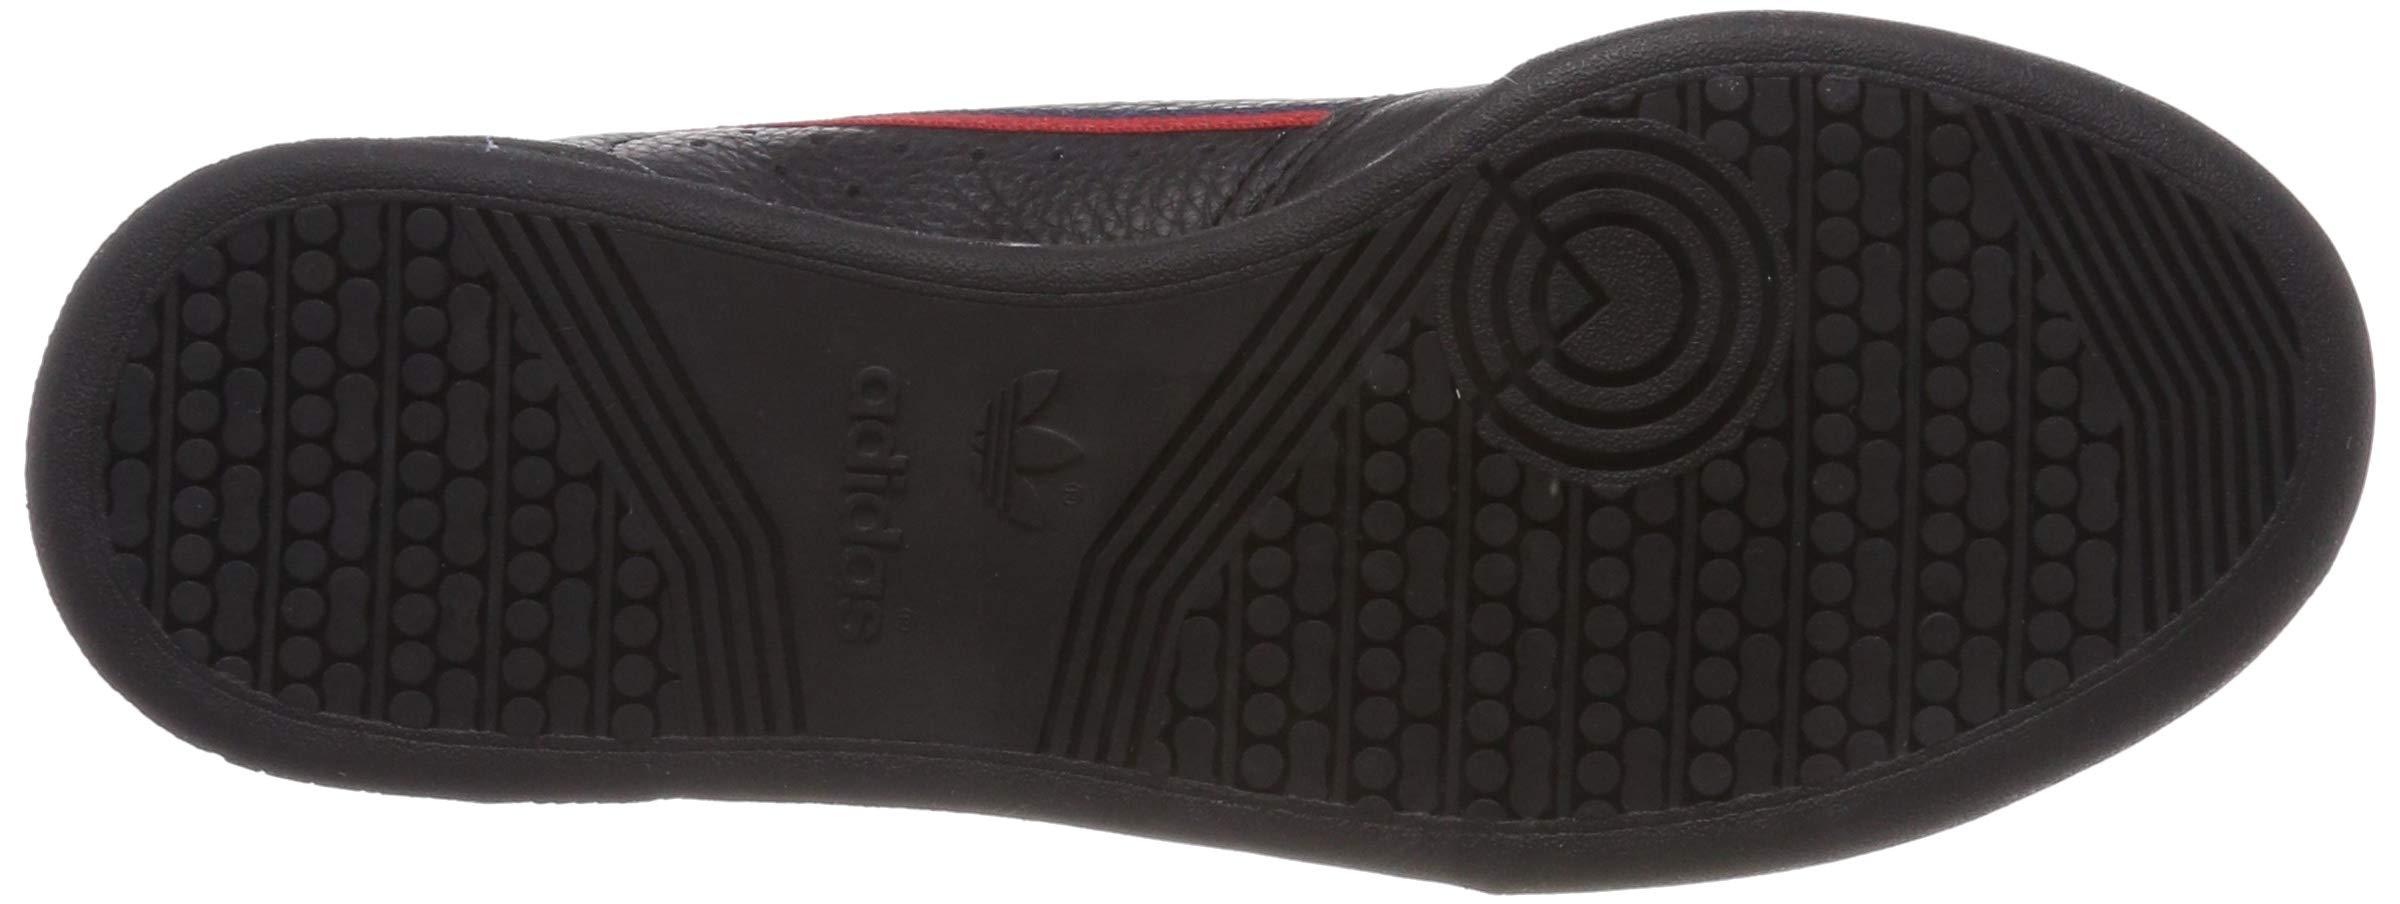 adidas Continental 80, Scarpe da Ginnastica Uomo 3 spesavip